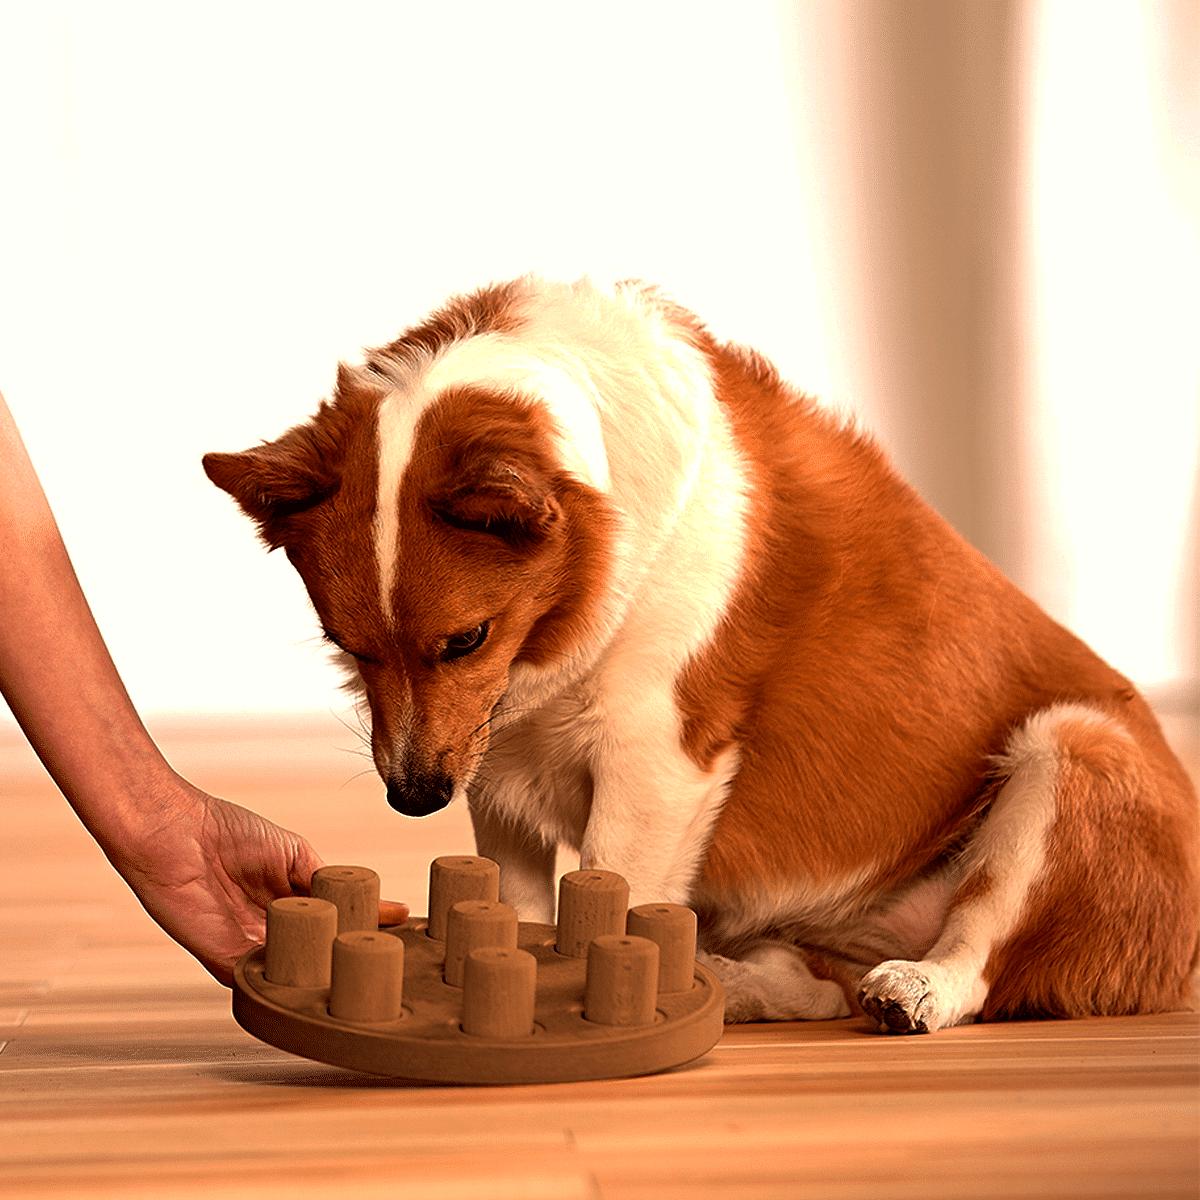 Låt hunden leta efter godiset i spelet Dog Smart